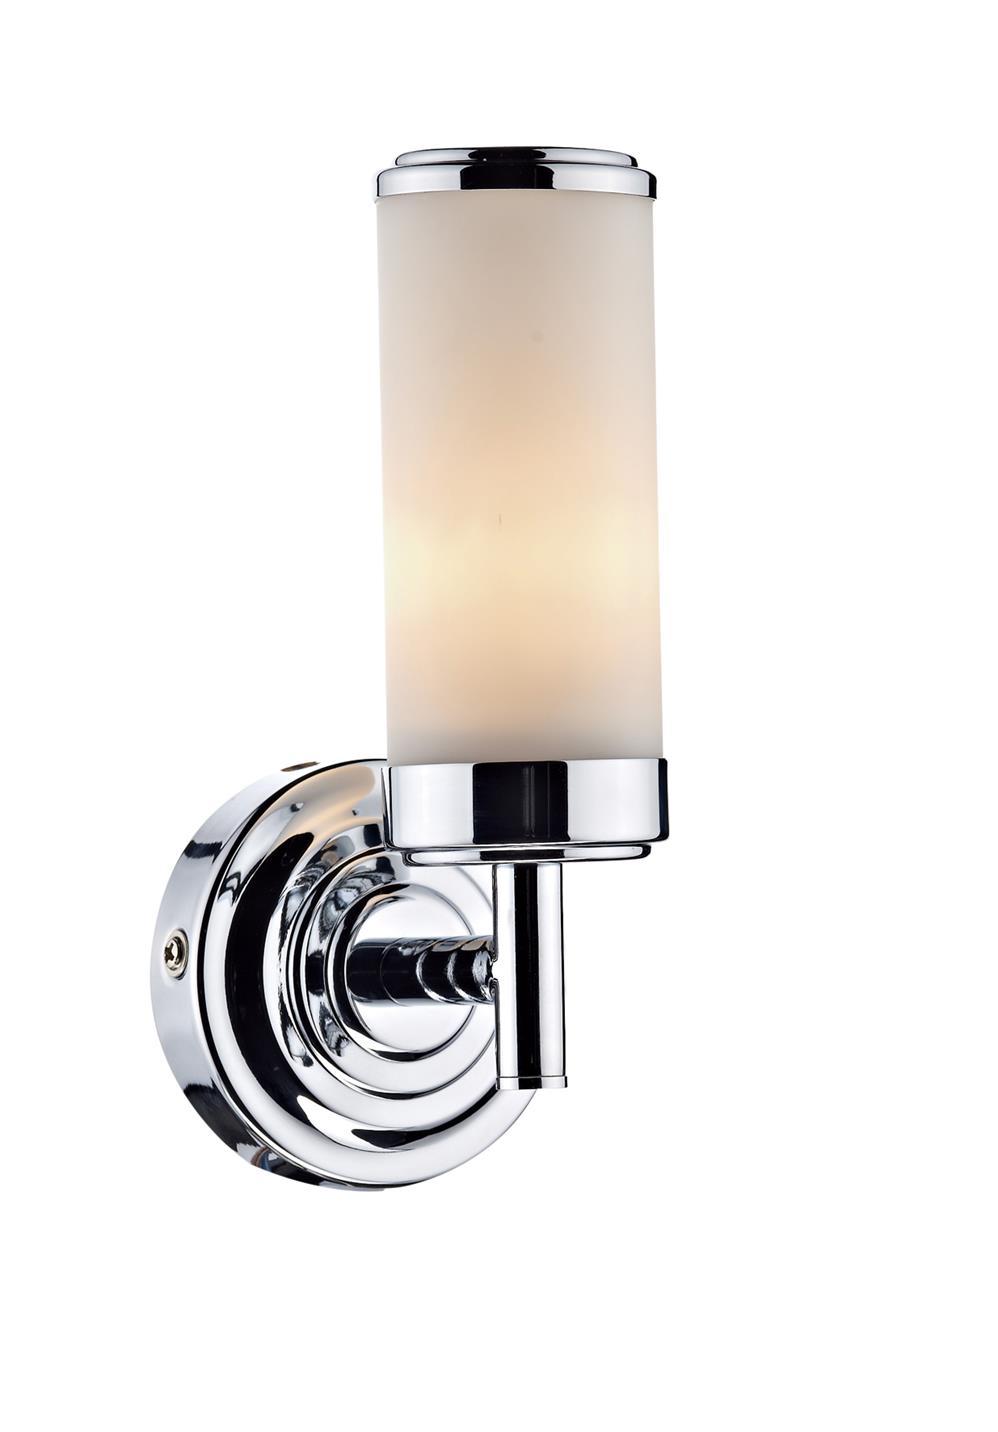 Dar CEN191 Century Spare Glass Shade for CEN0750 & CEN0950